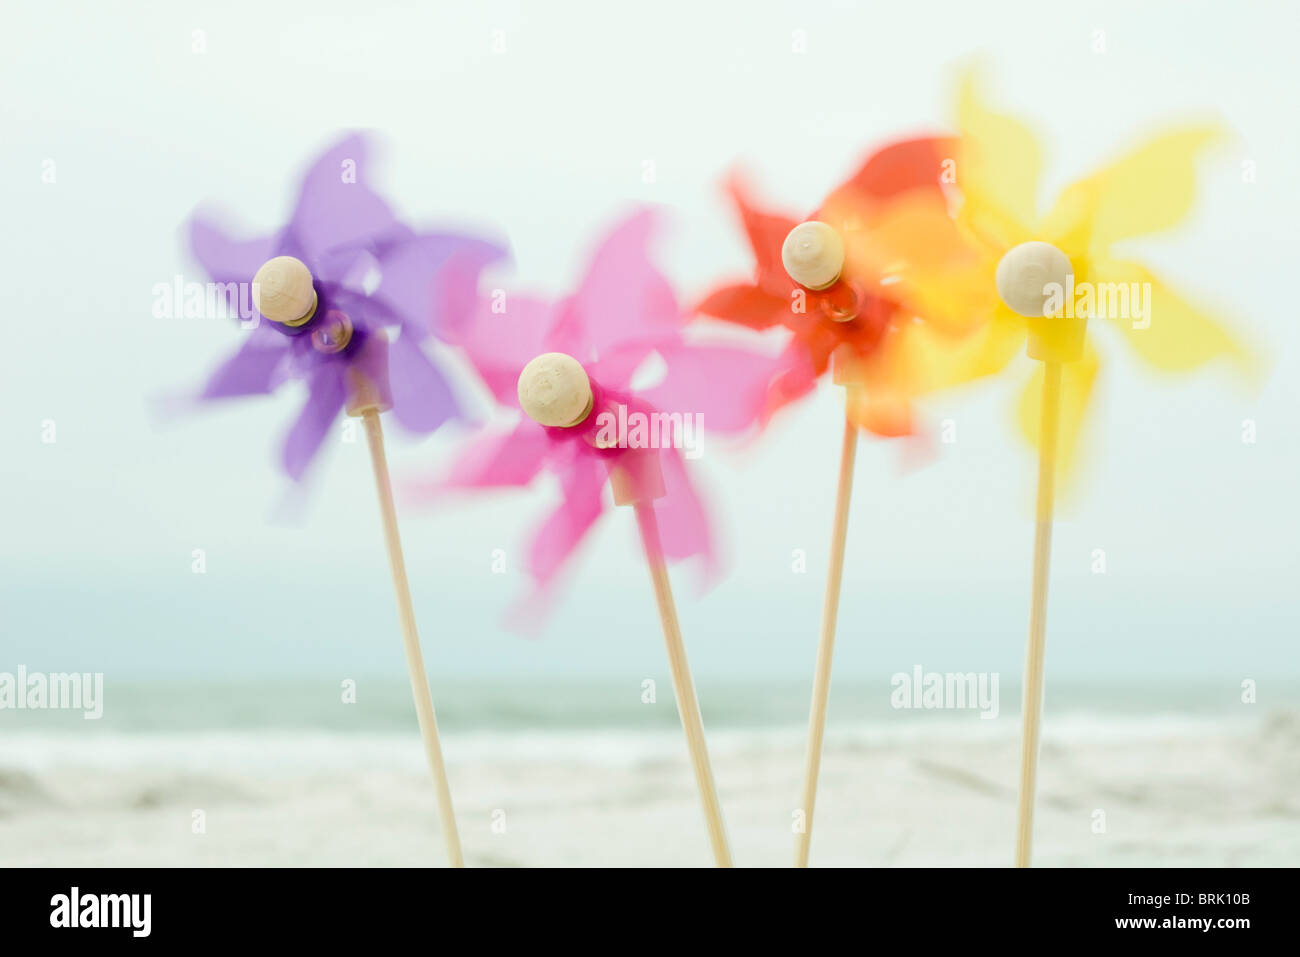 Pinwheels spinning in wind Photo Stock